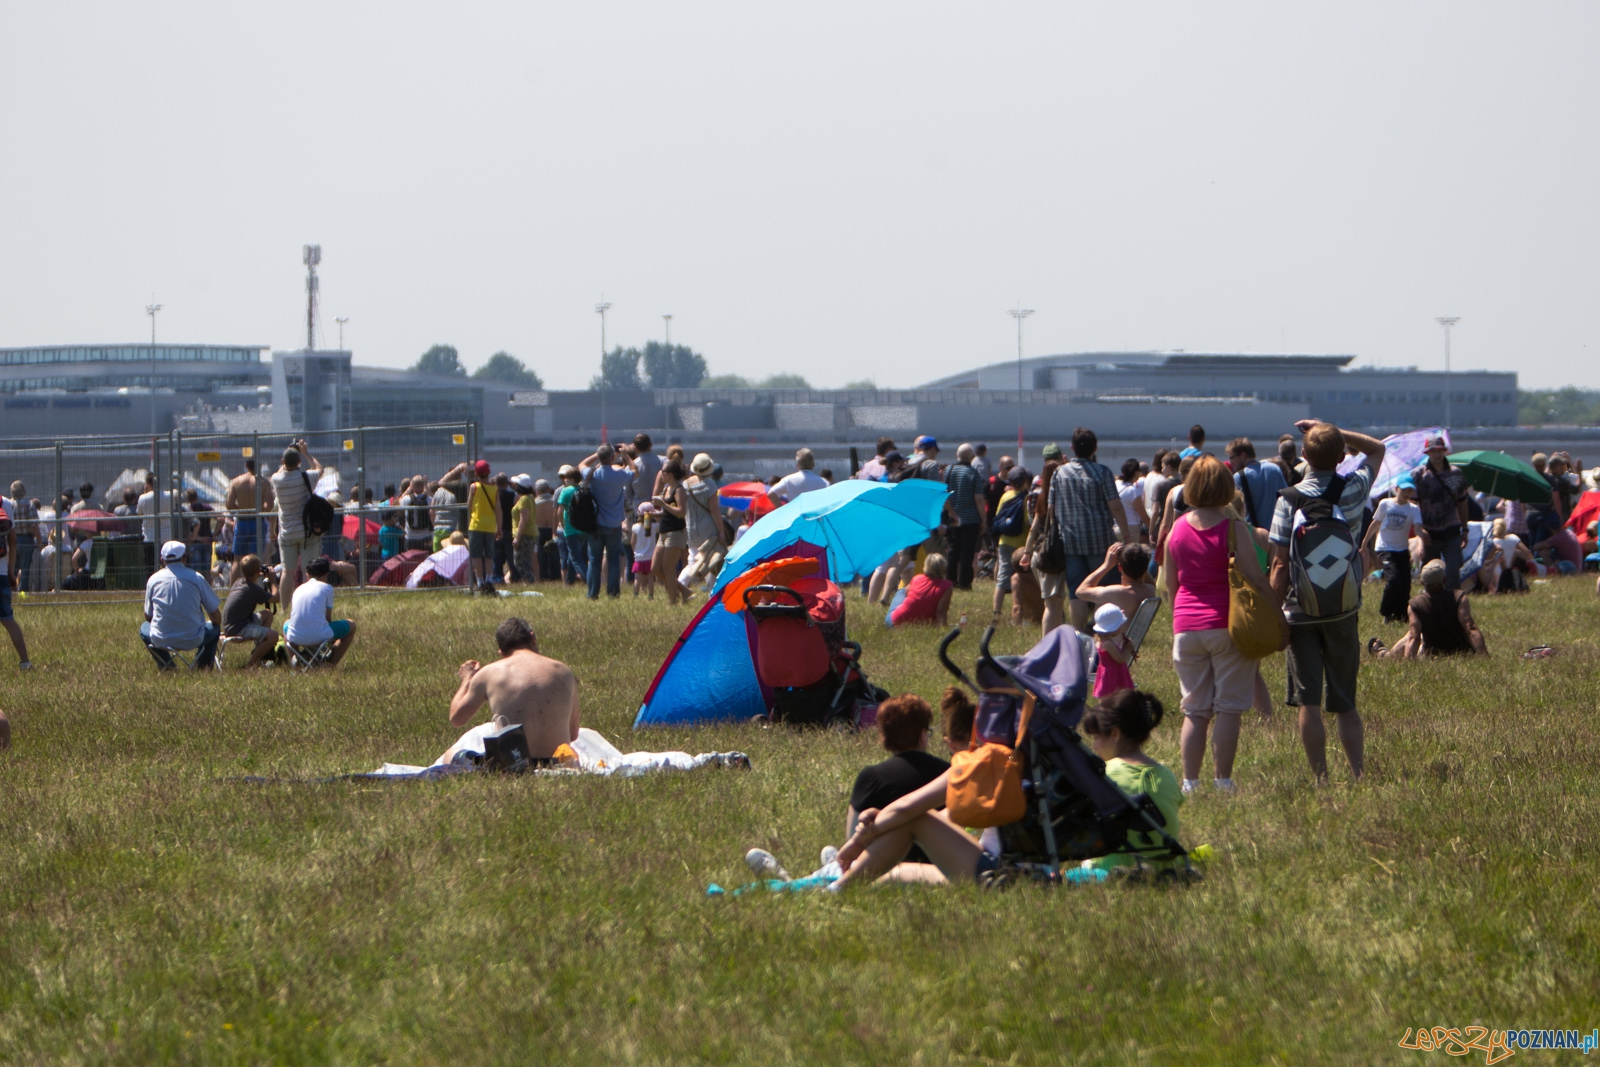 Aerofestival 2015  Foto: lepszyPOZNAN.pl /Piotr Rychter